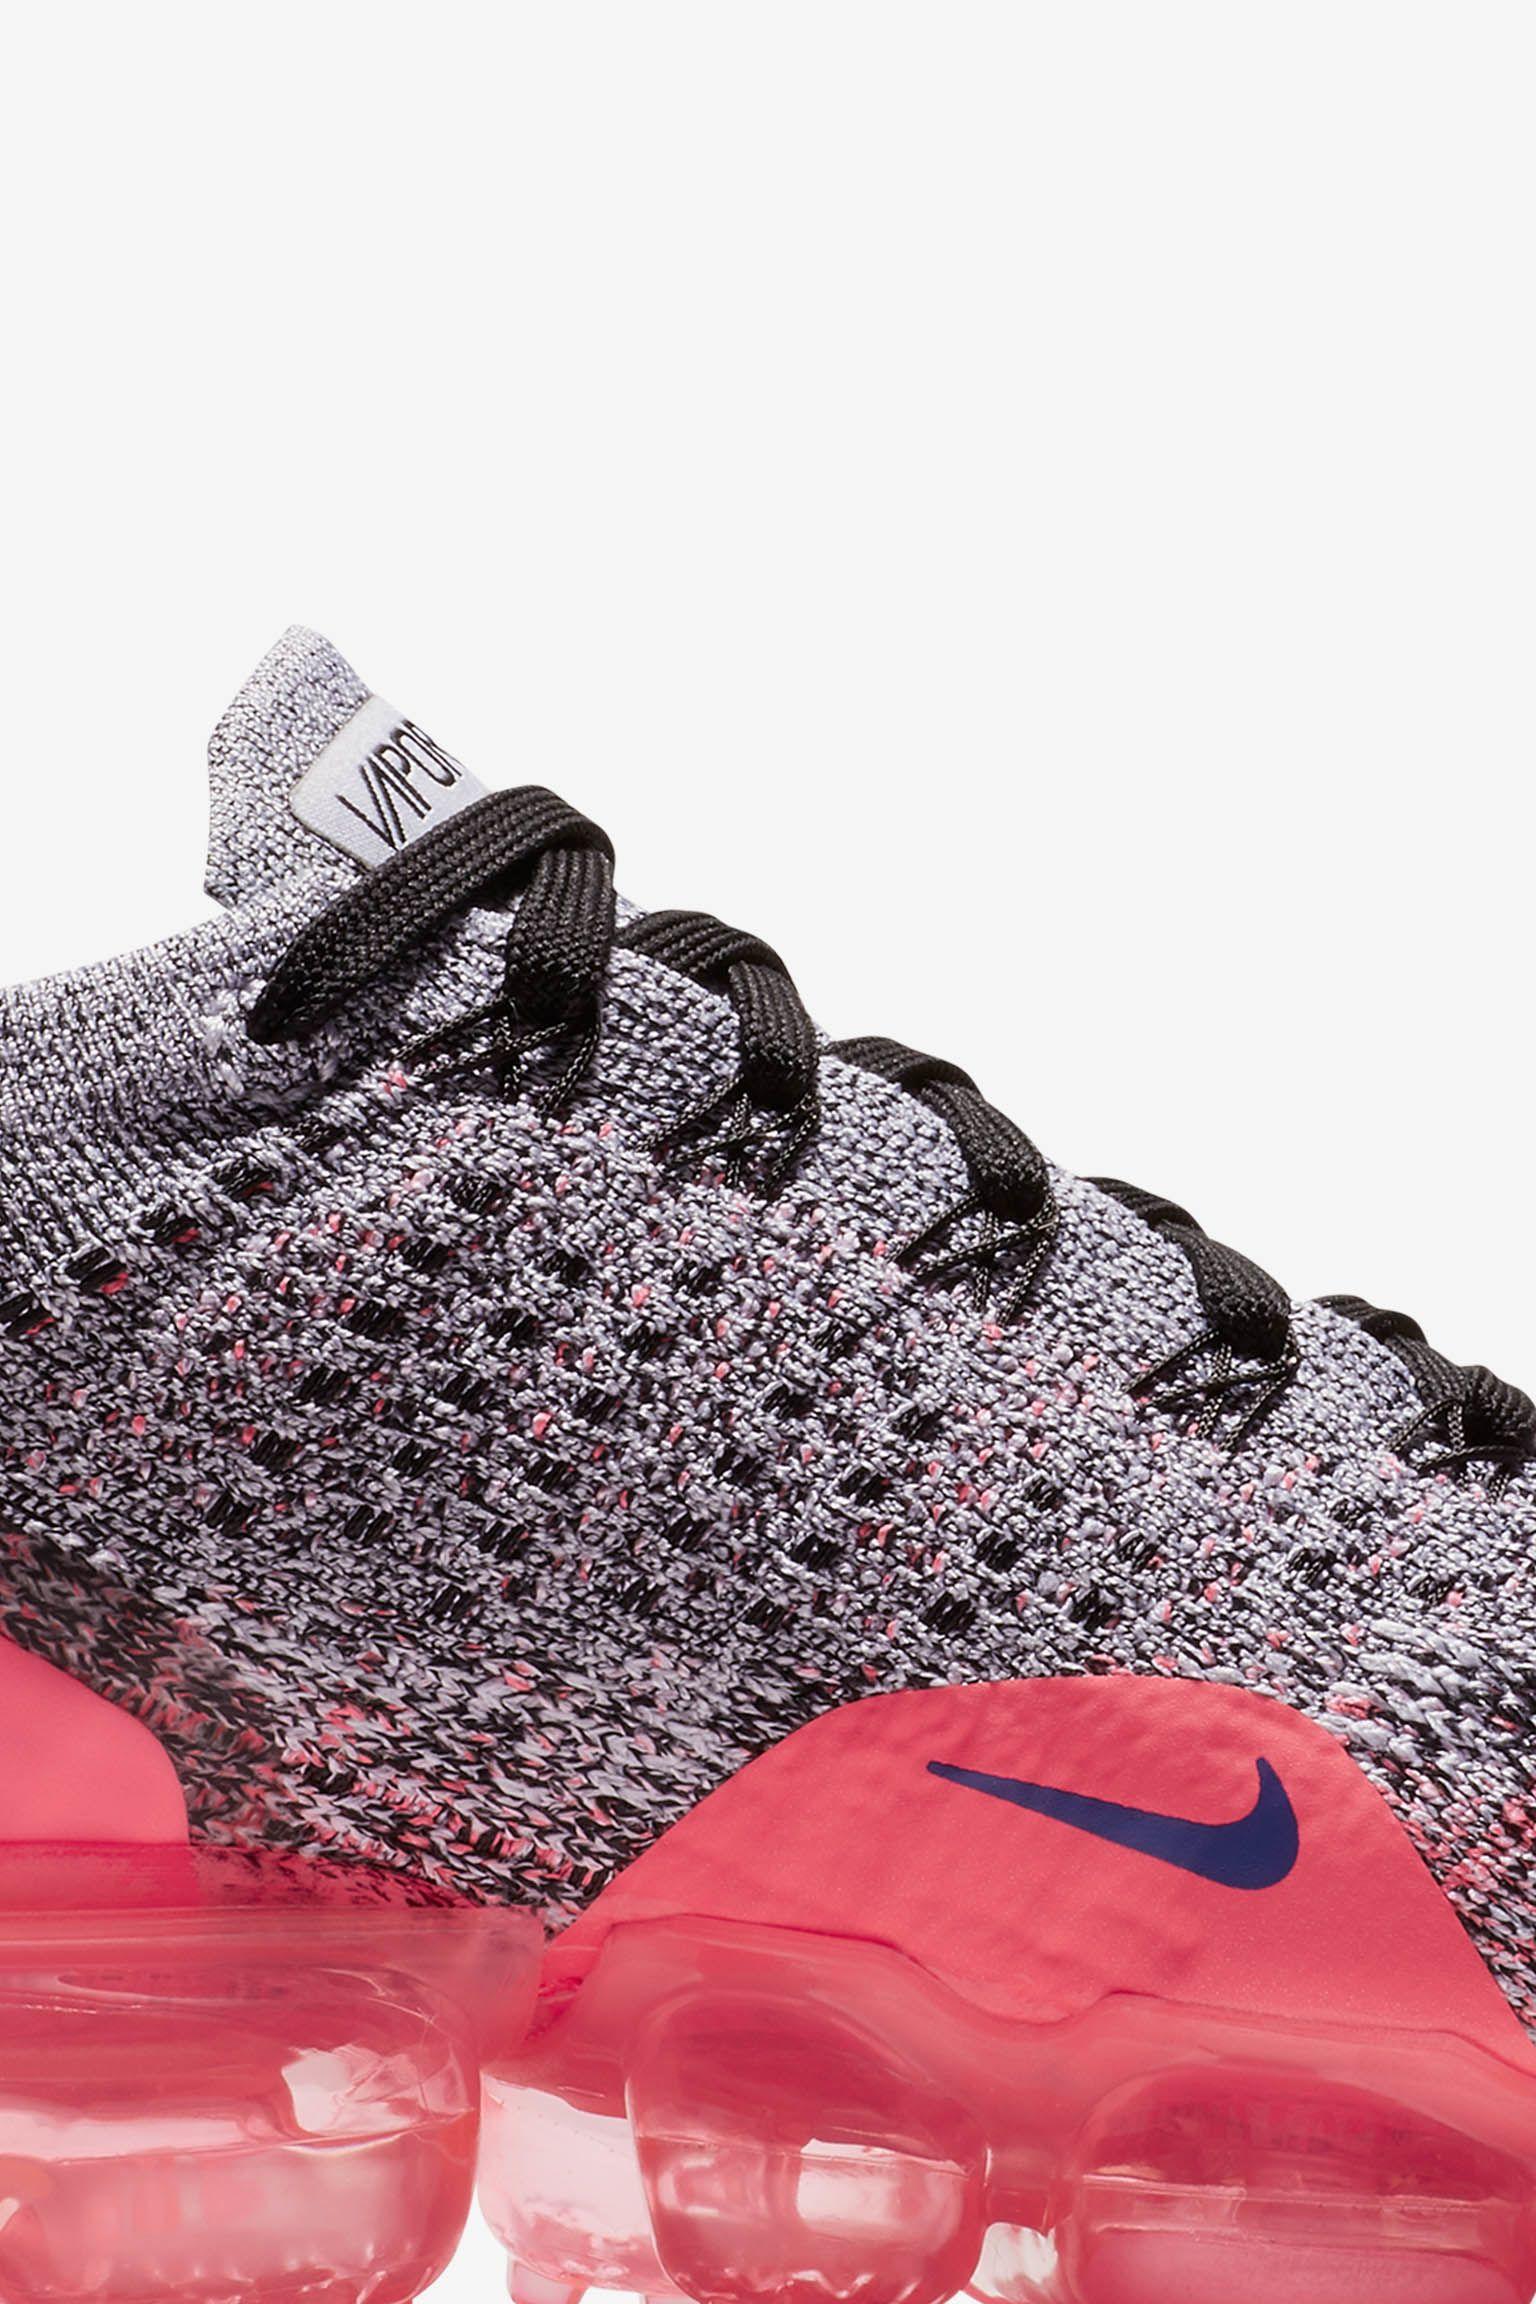 Nike Women's Air Vapormax Flyknit 2 'Ultramarine & Hot Punch' Release Date